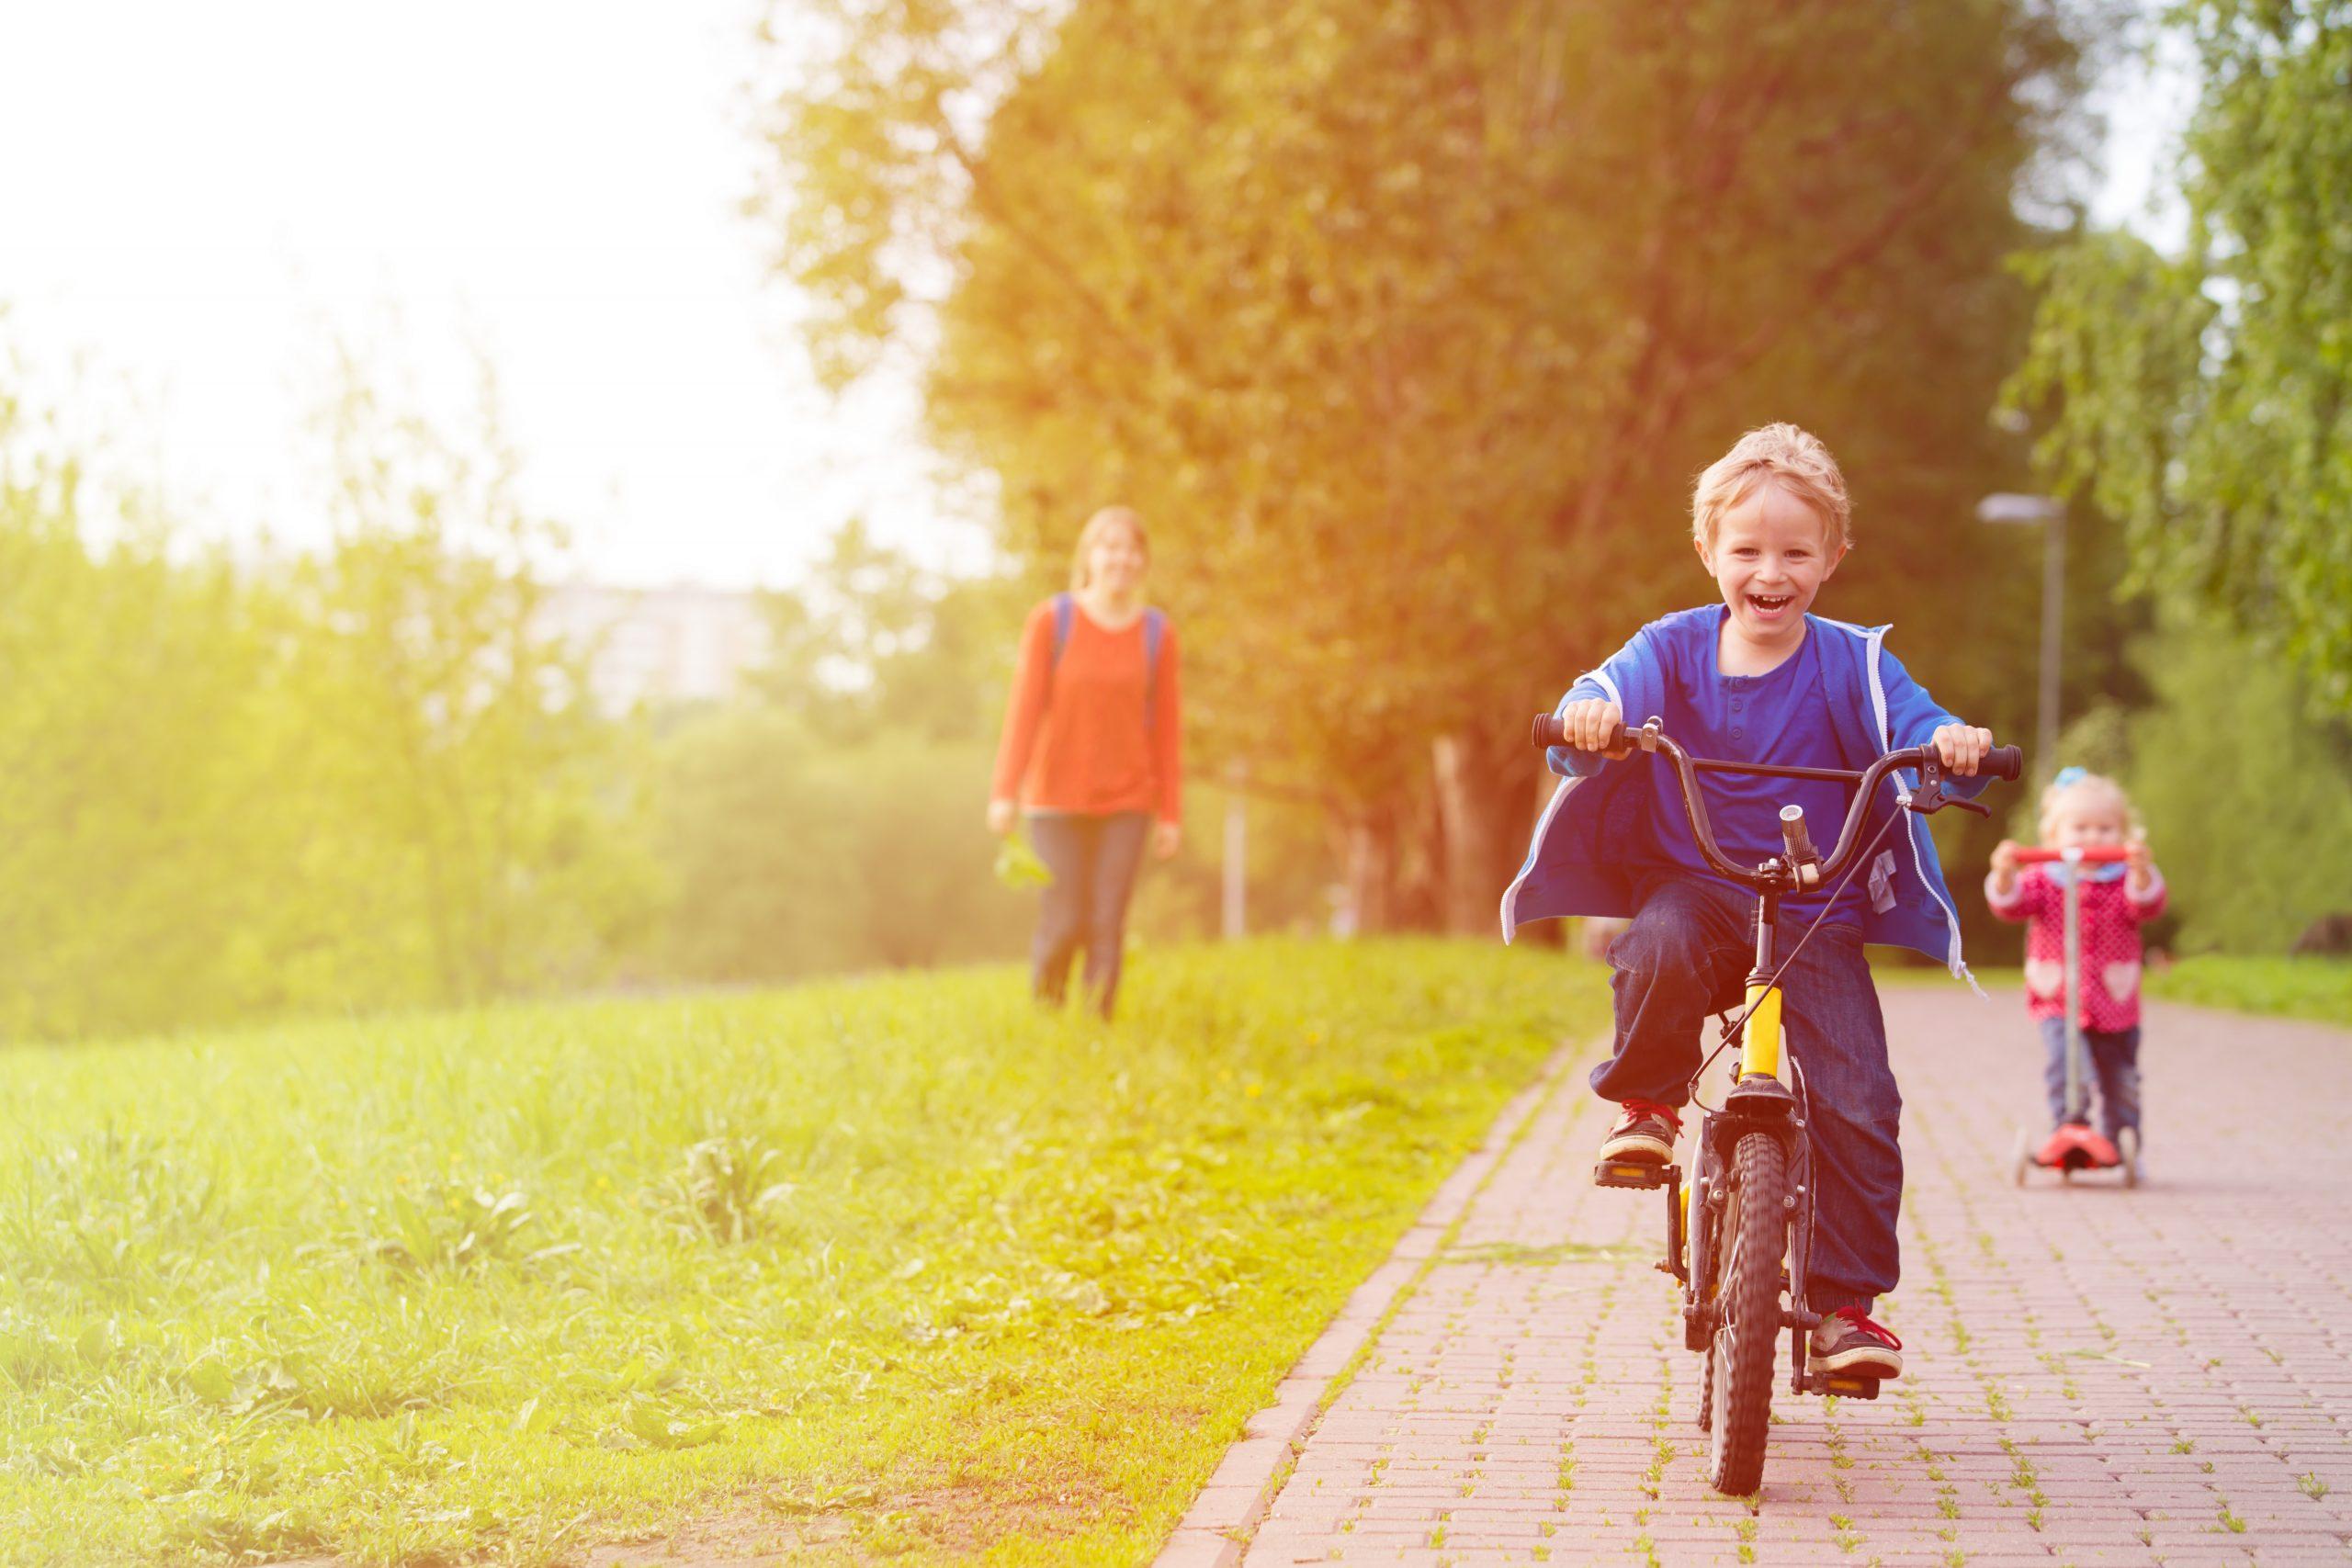 Kid enjoying outdoor activities, like riding a bike